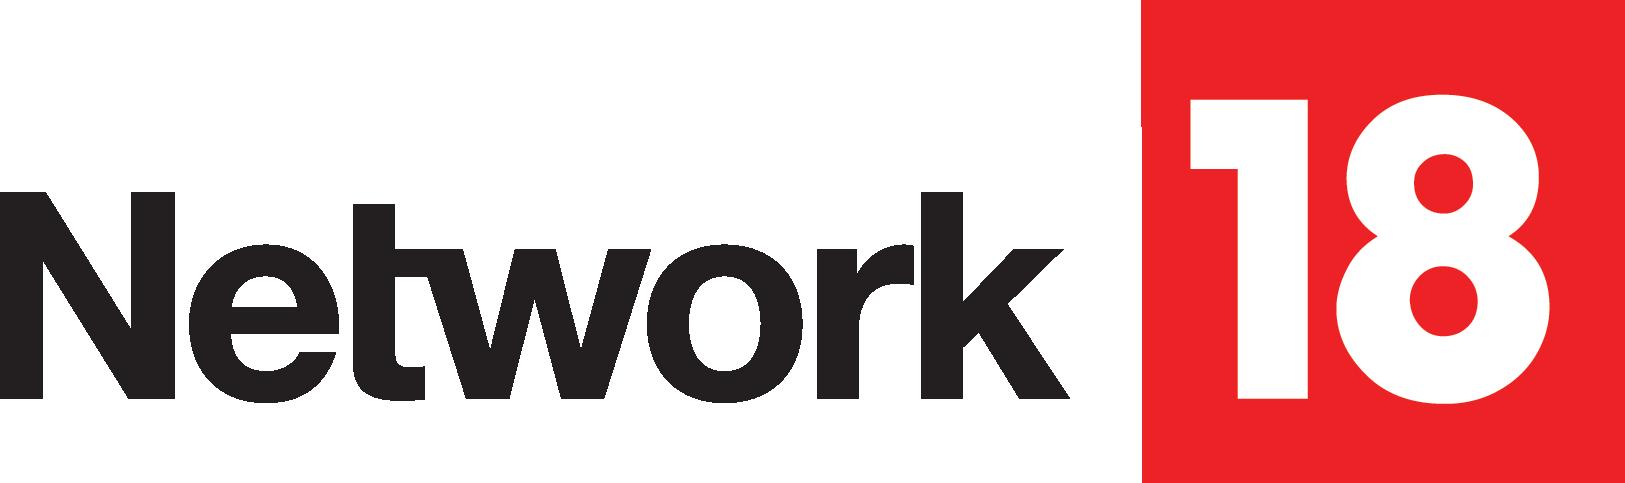 Network18logo_K